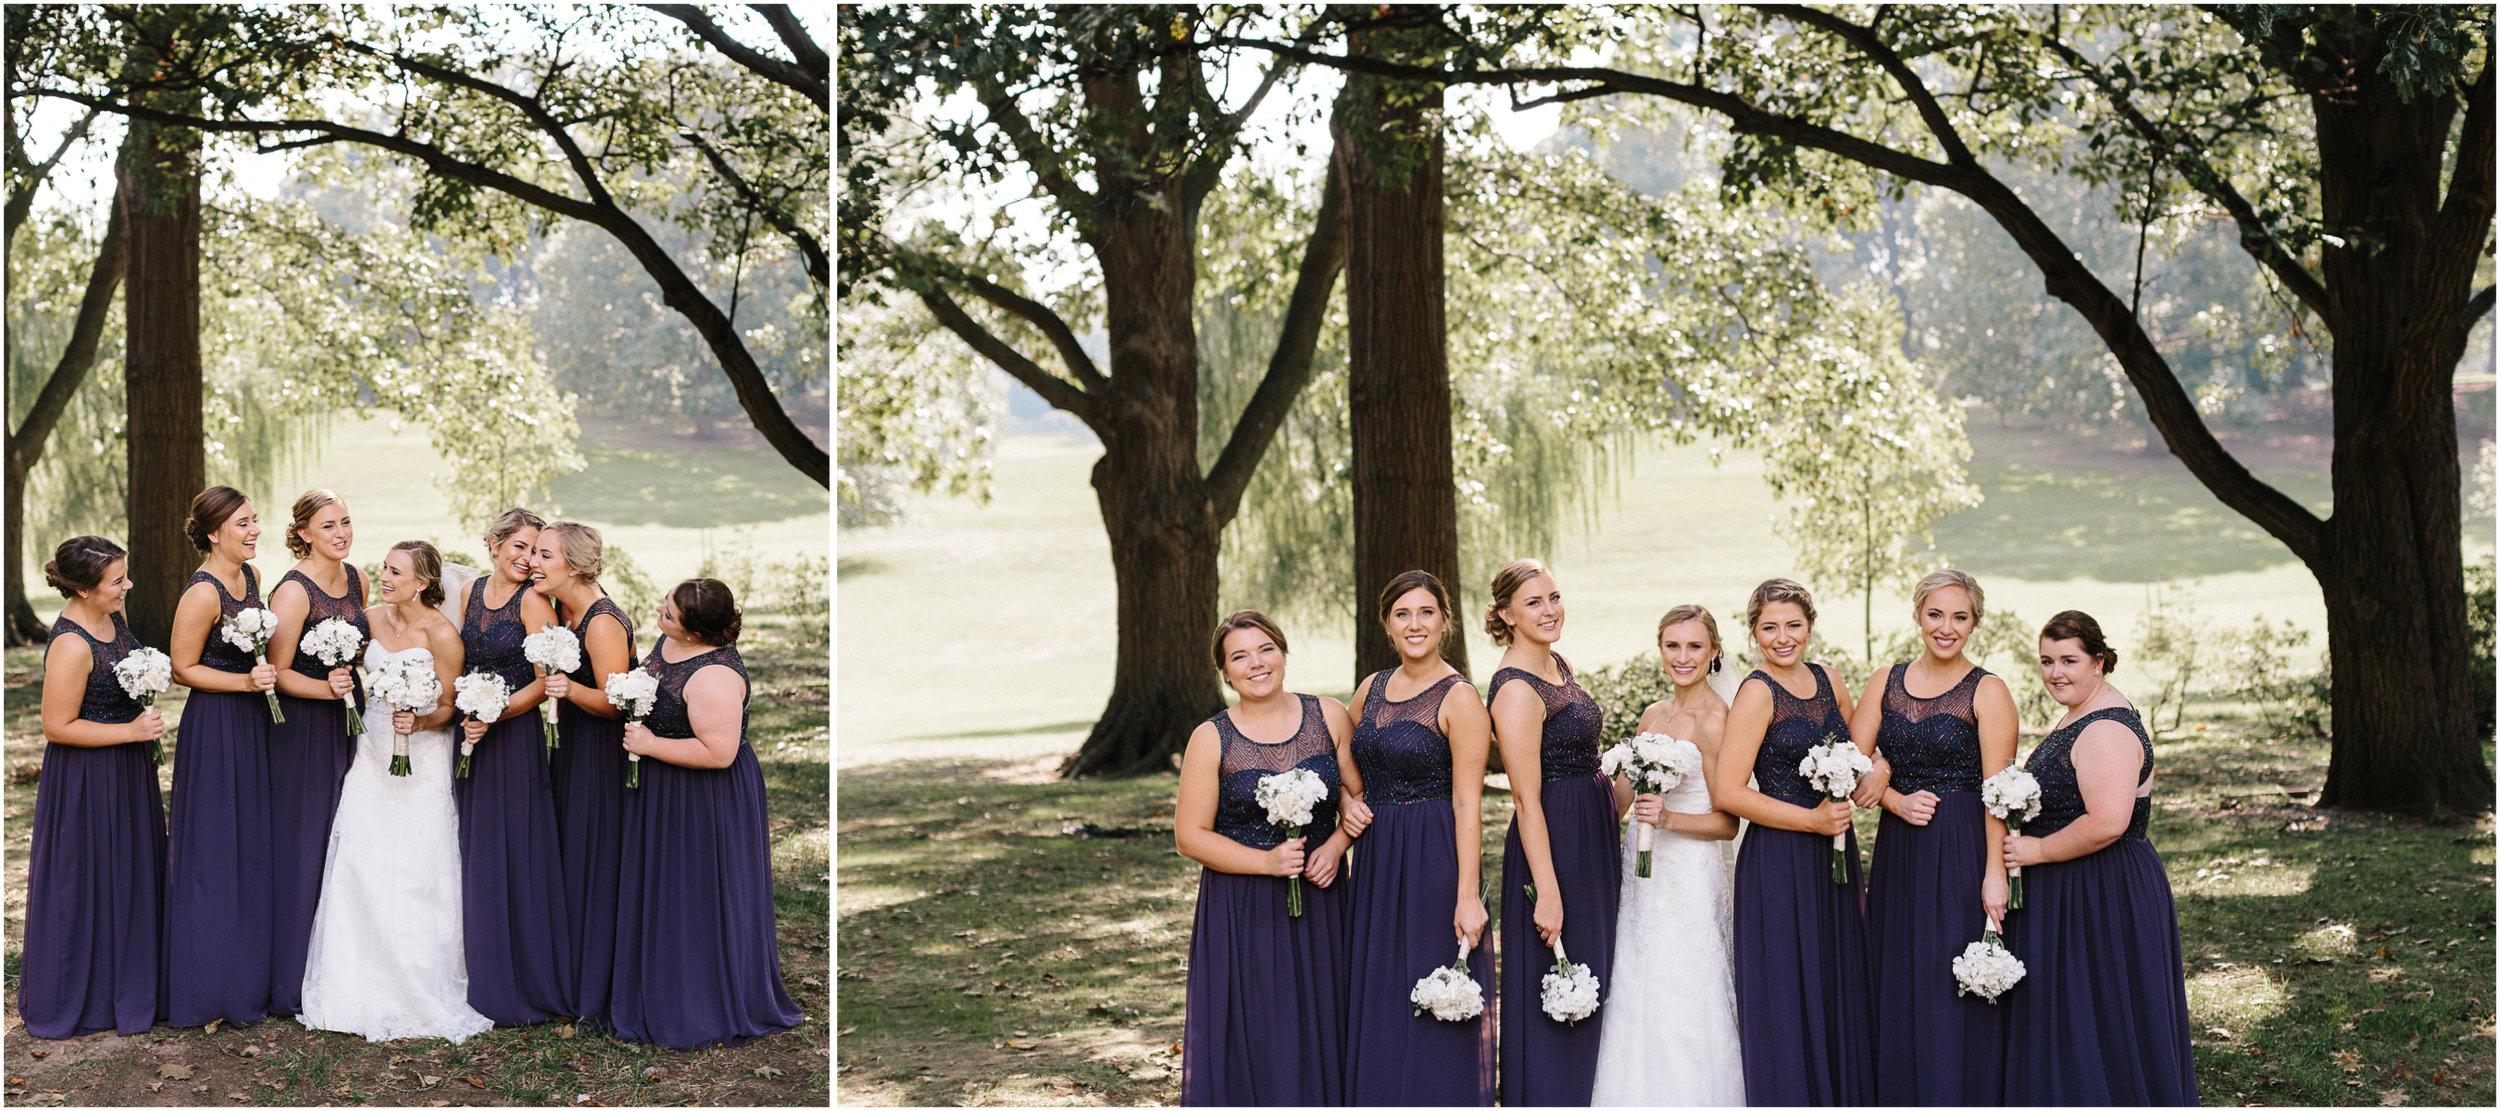 alyssa barletter photography kansas city wedding photographer katie and kendall-31.jpg